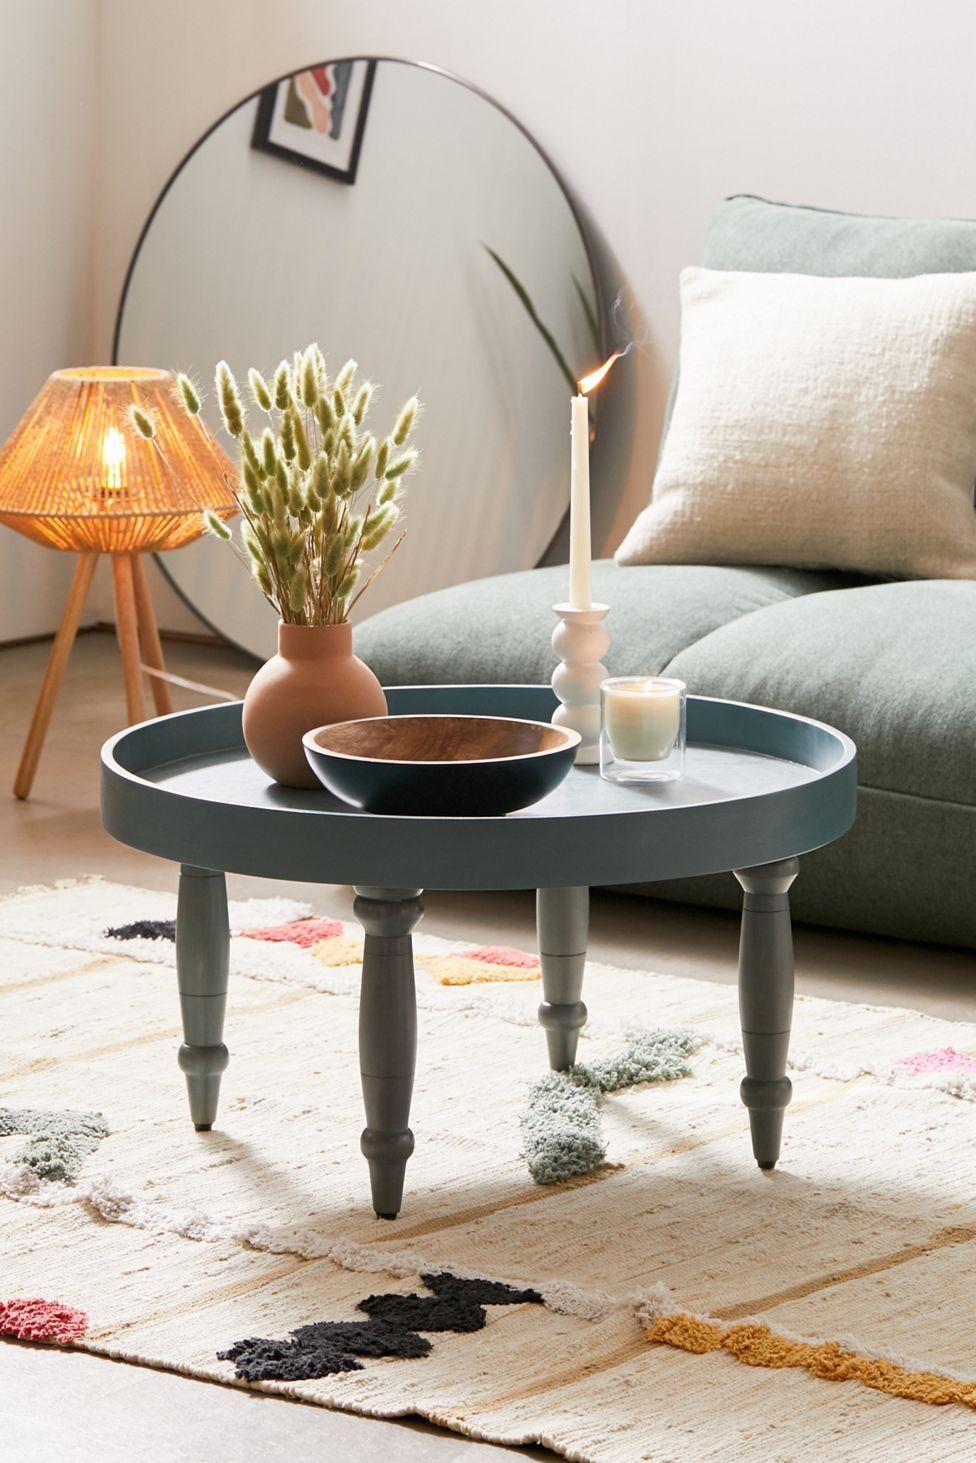 Pin By Andrea Martin On Deko Coffee Table Wood Coffee Table Coffee Table Urban Outfitters [ 1463 x 976 Pixel ]